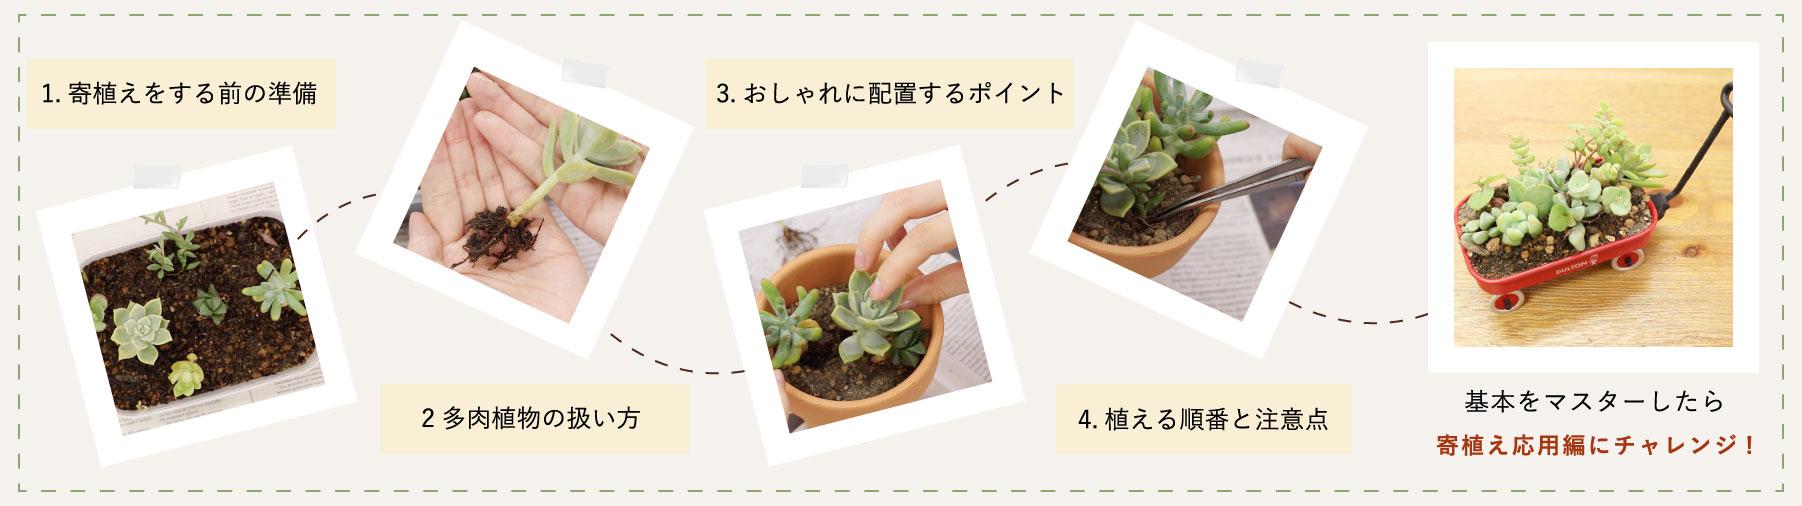 Plant master pc